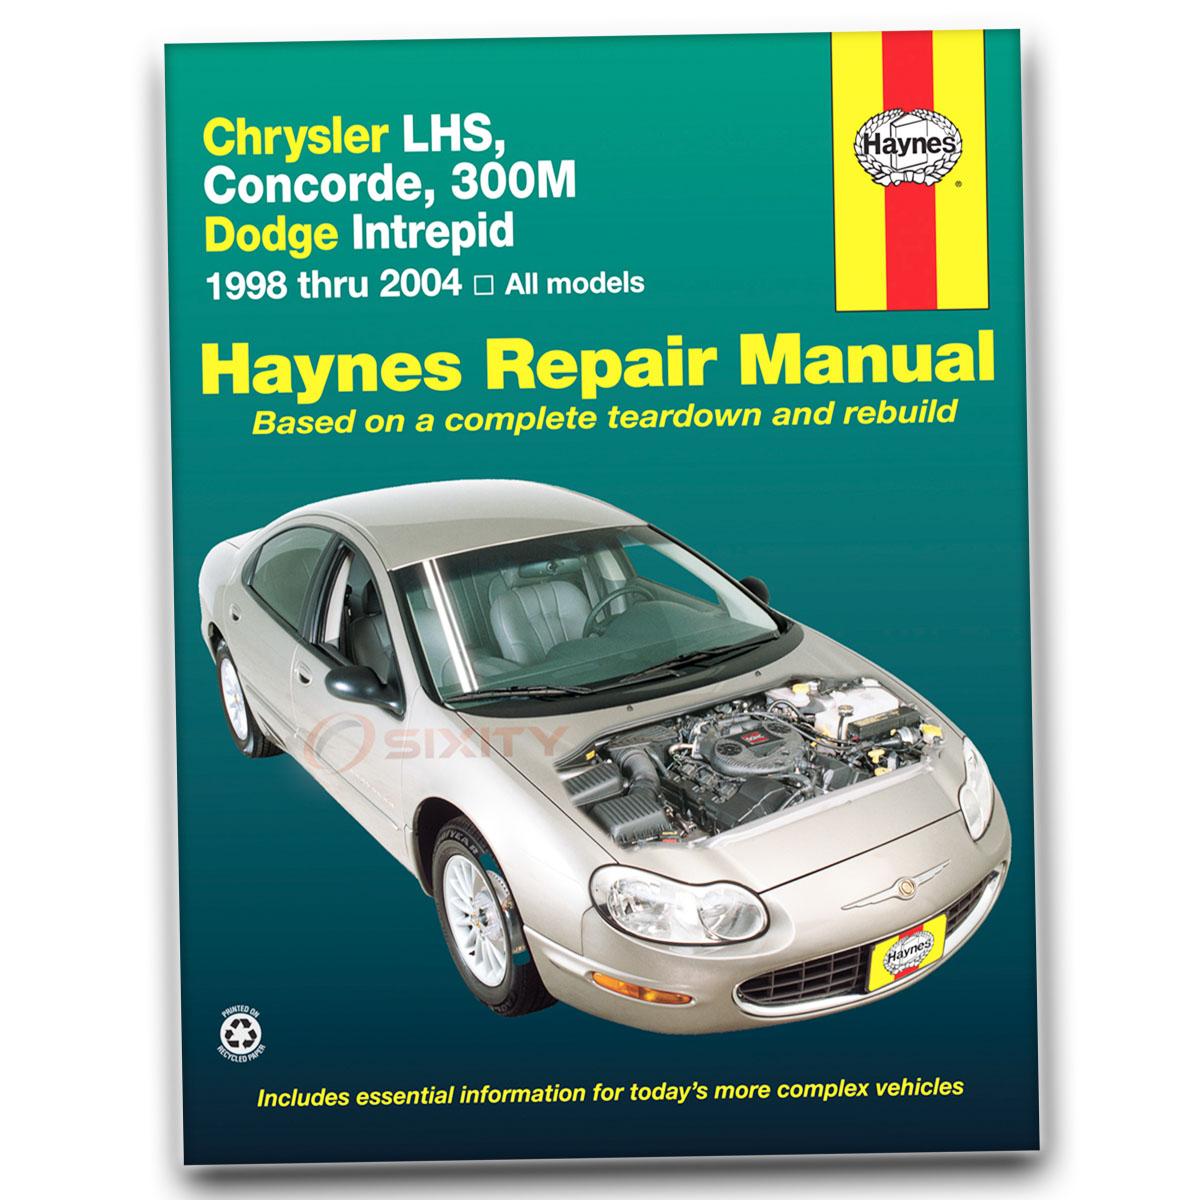 Haynes Repair Manual 25026 for Chrysler LHS Concorde 300M Dodge Intrepid ie